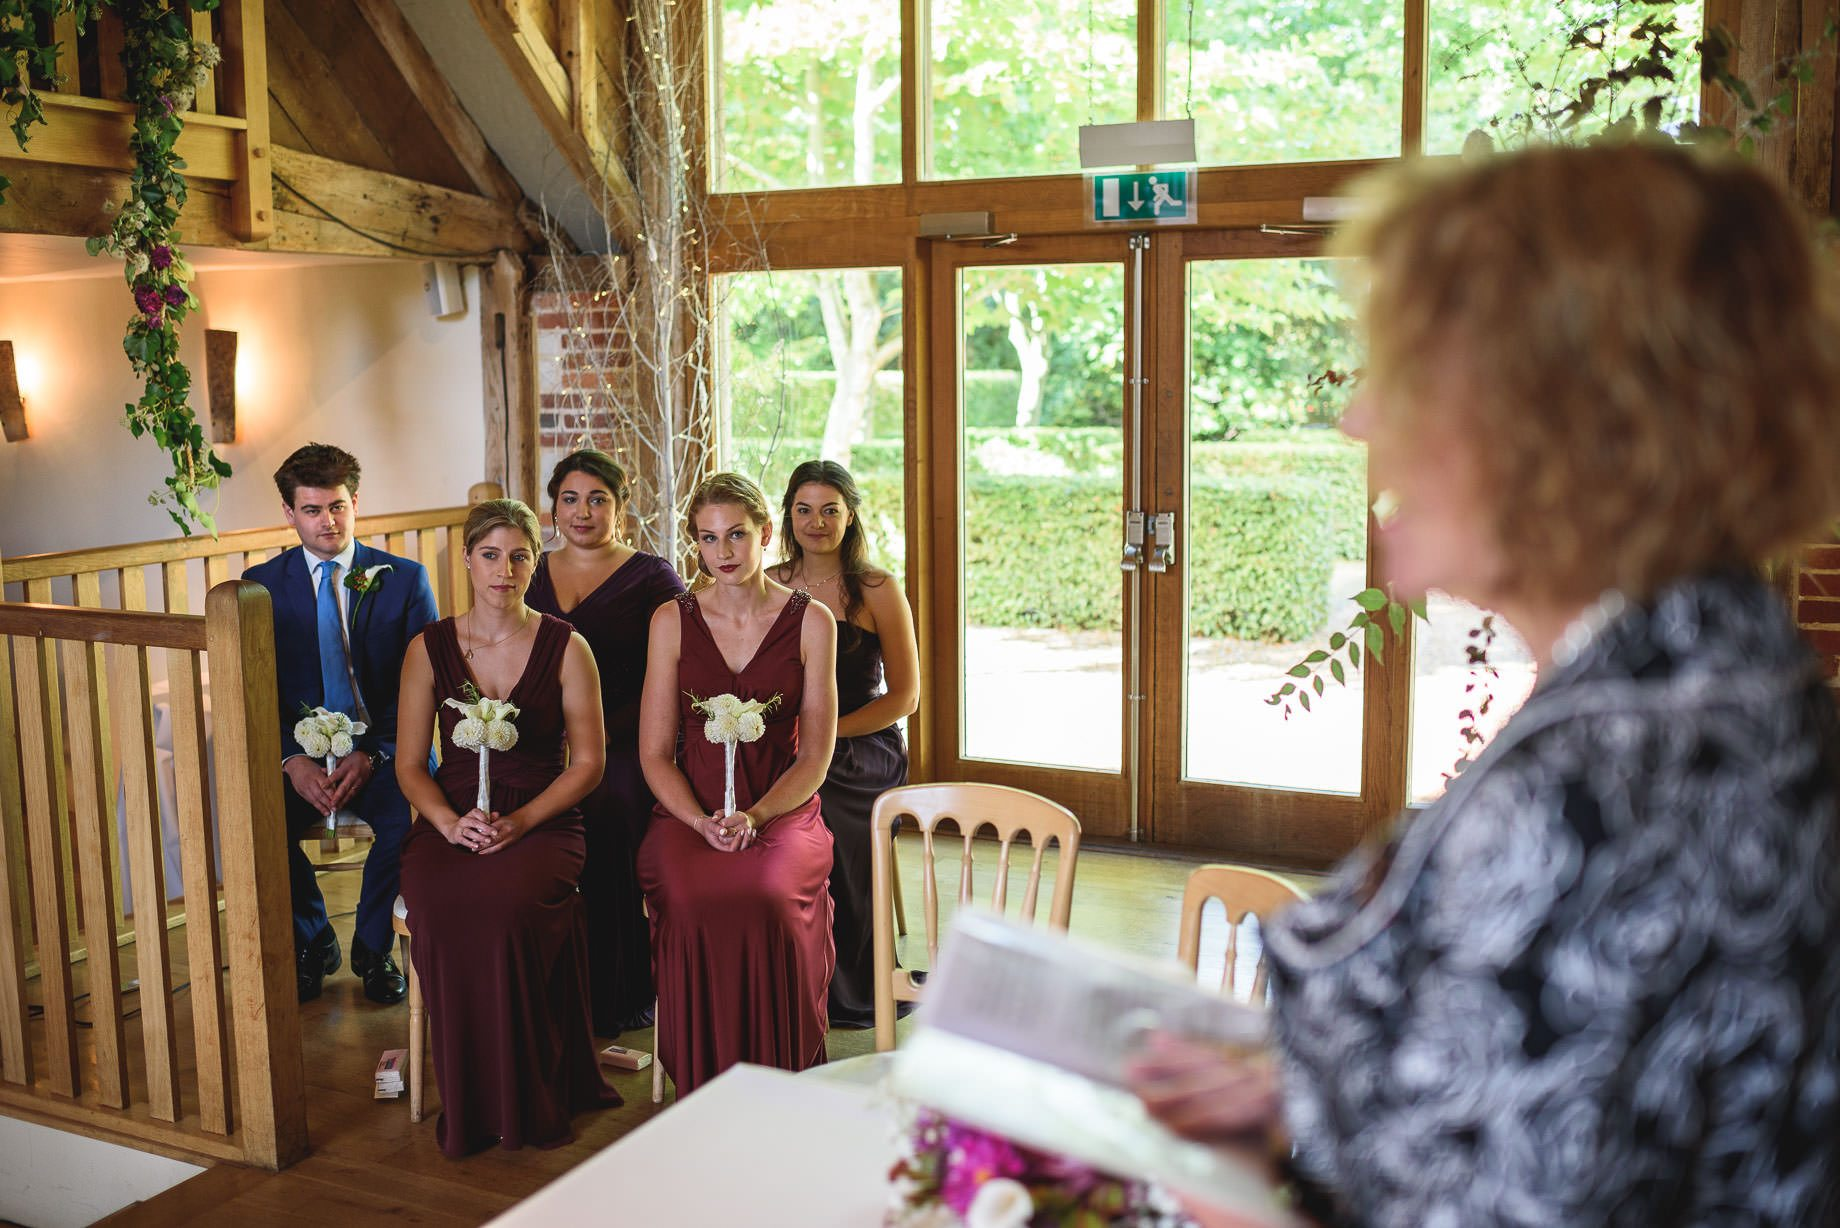 bury-court-barn-wedding-photography-guy-collier-photography-nadia-tom-54-of-184